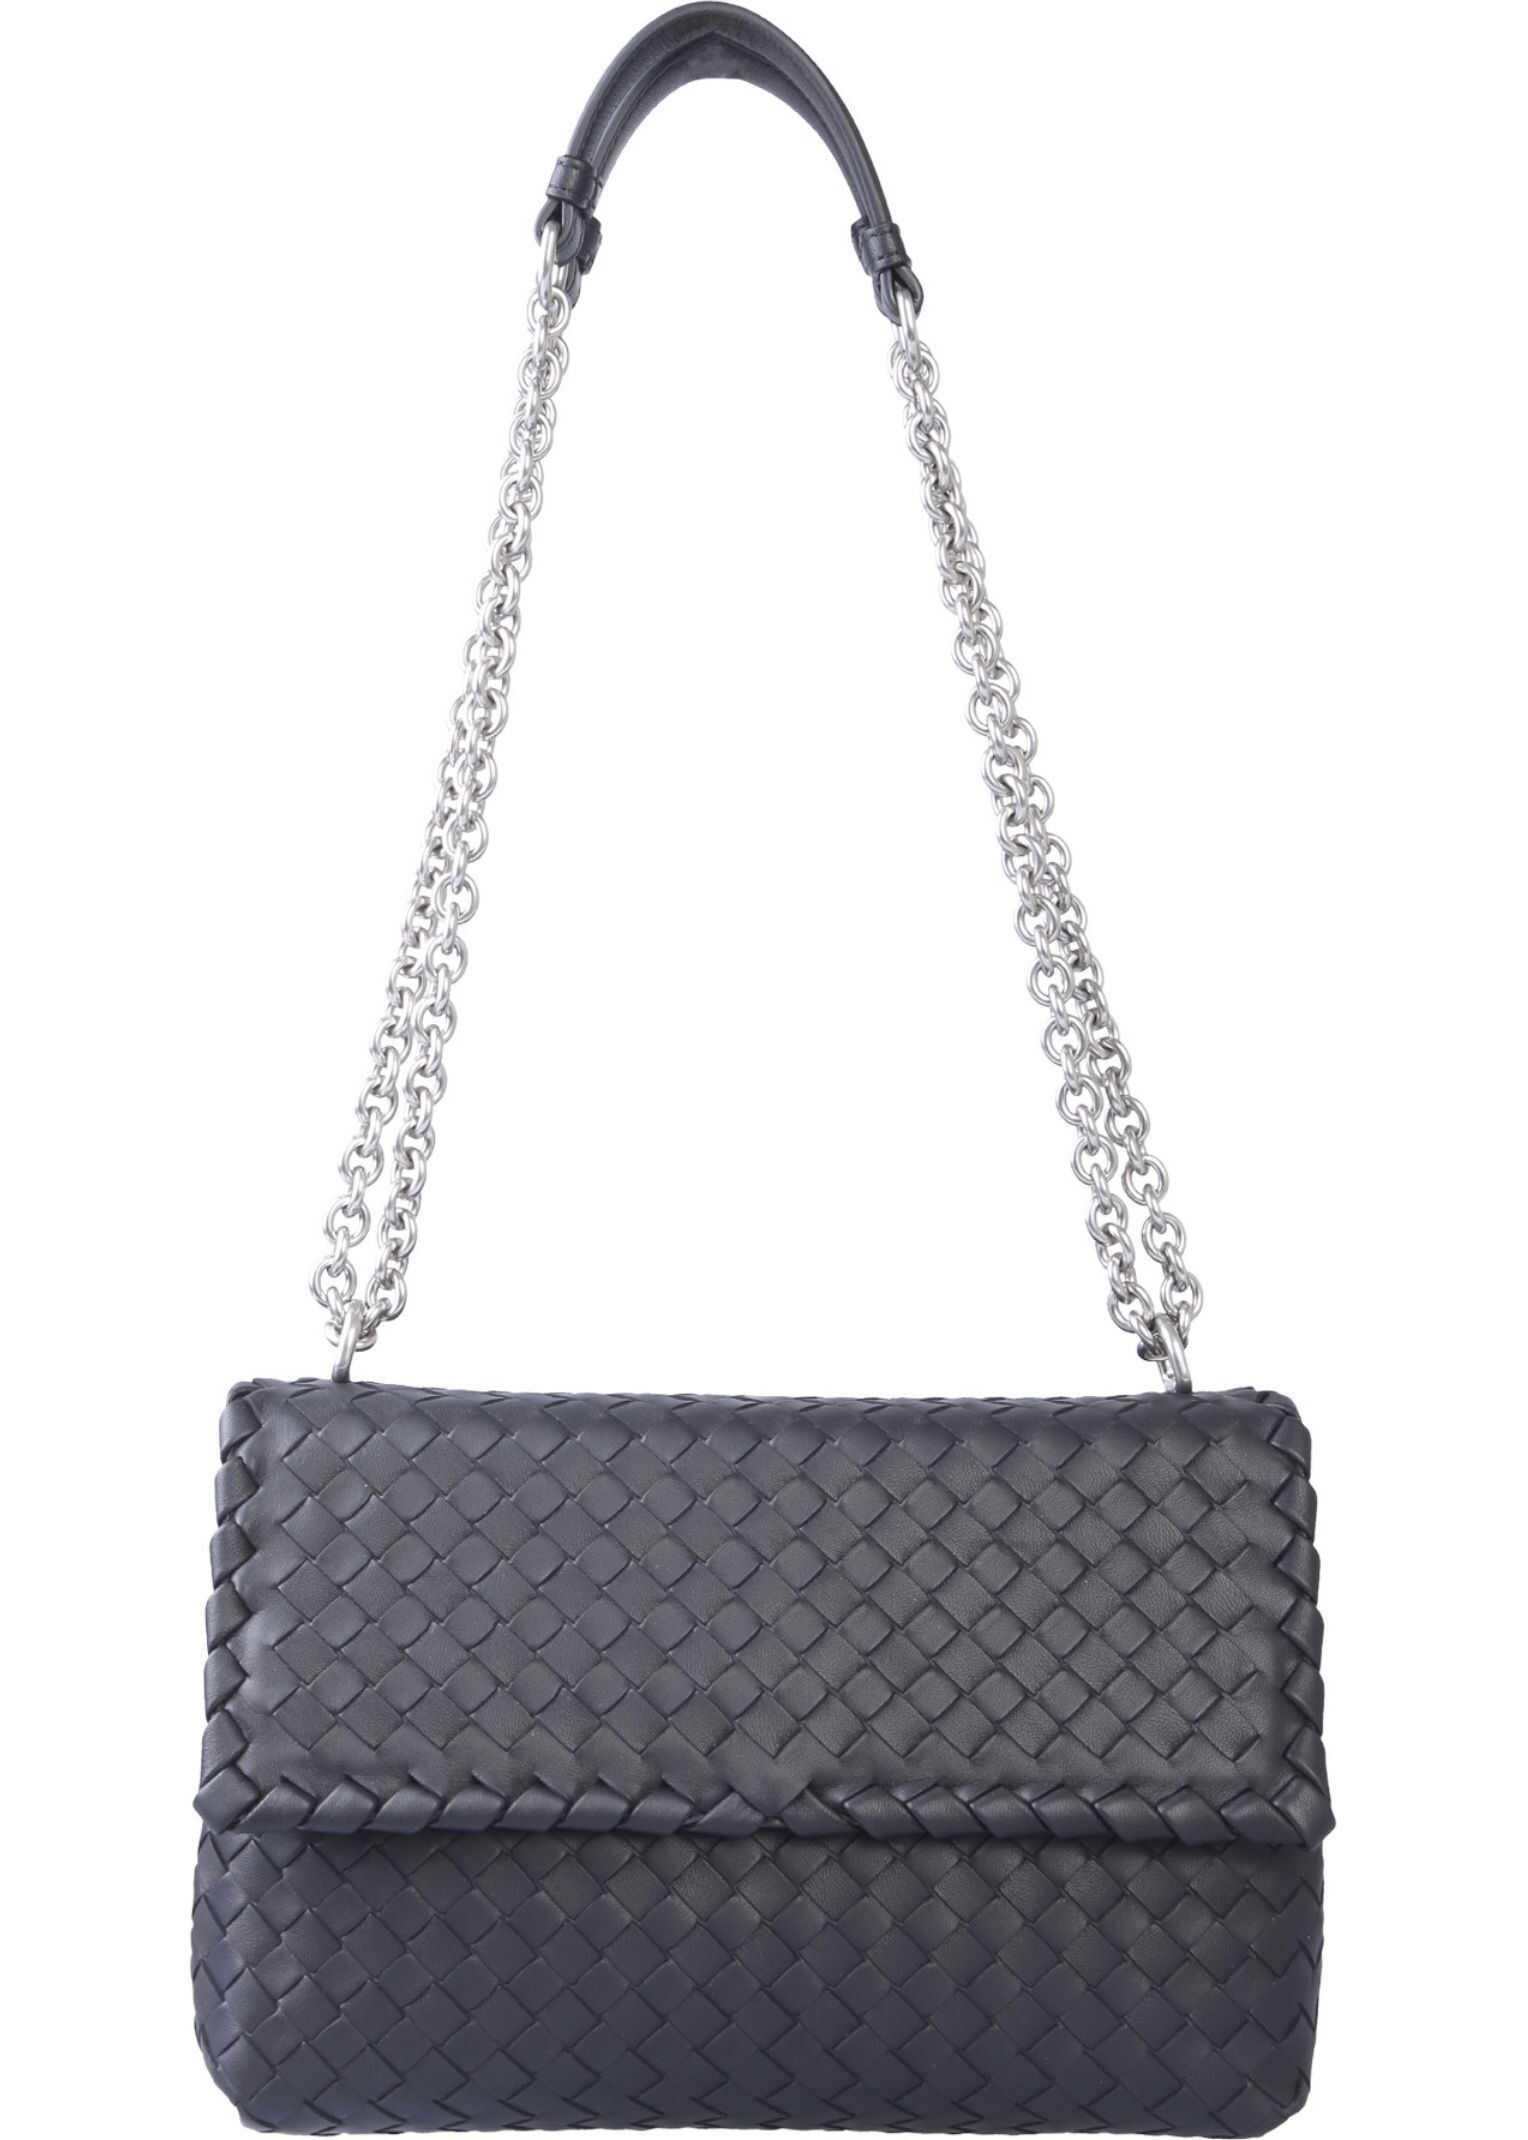 Bottega Veneta Small Olimpia Bag BLACK